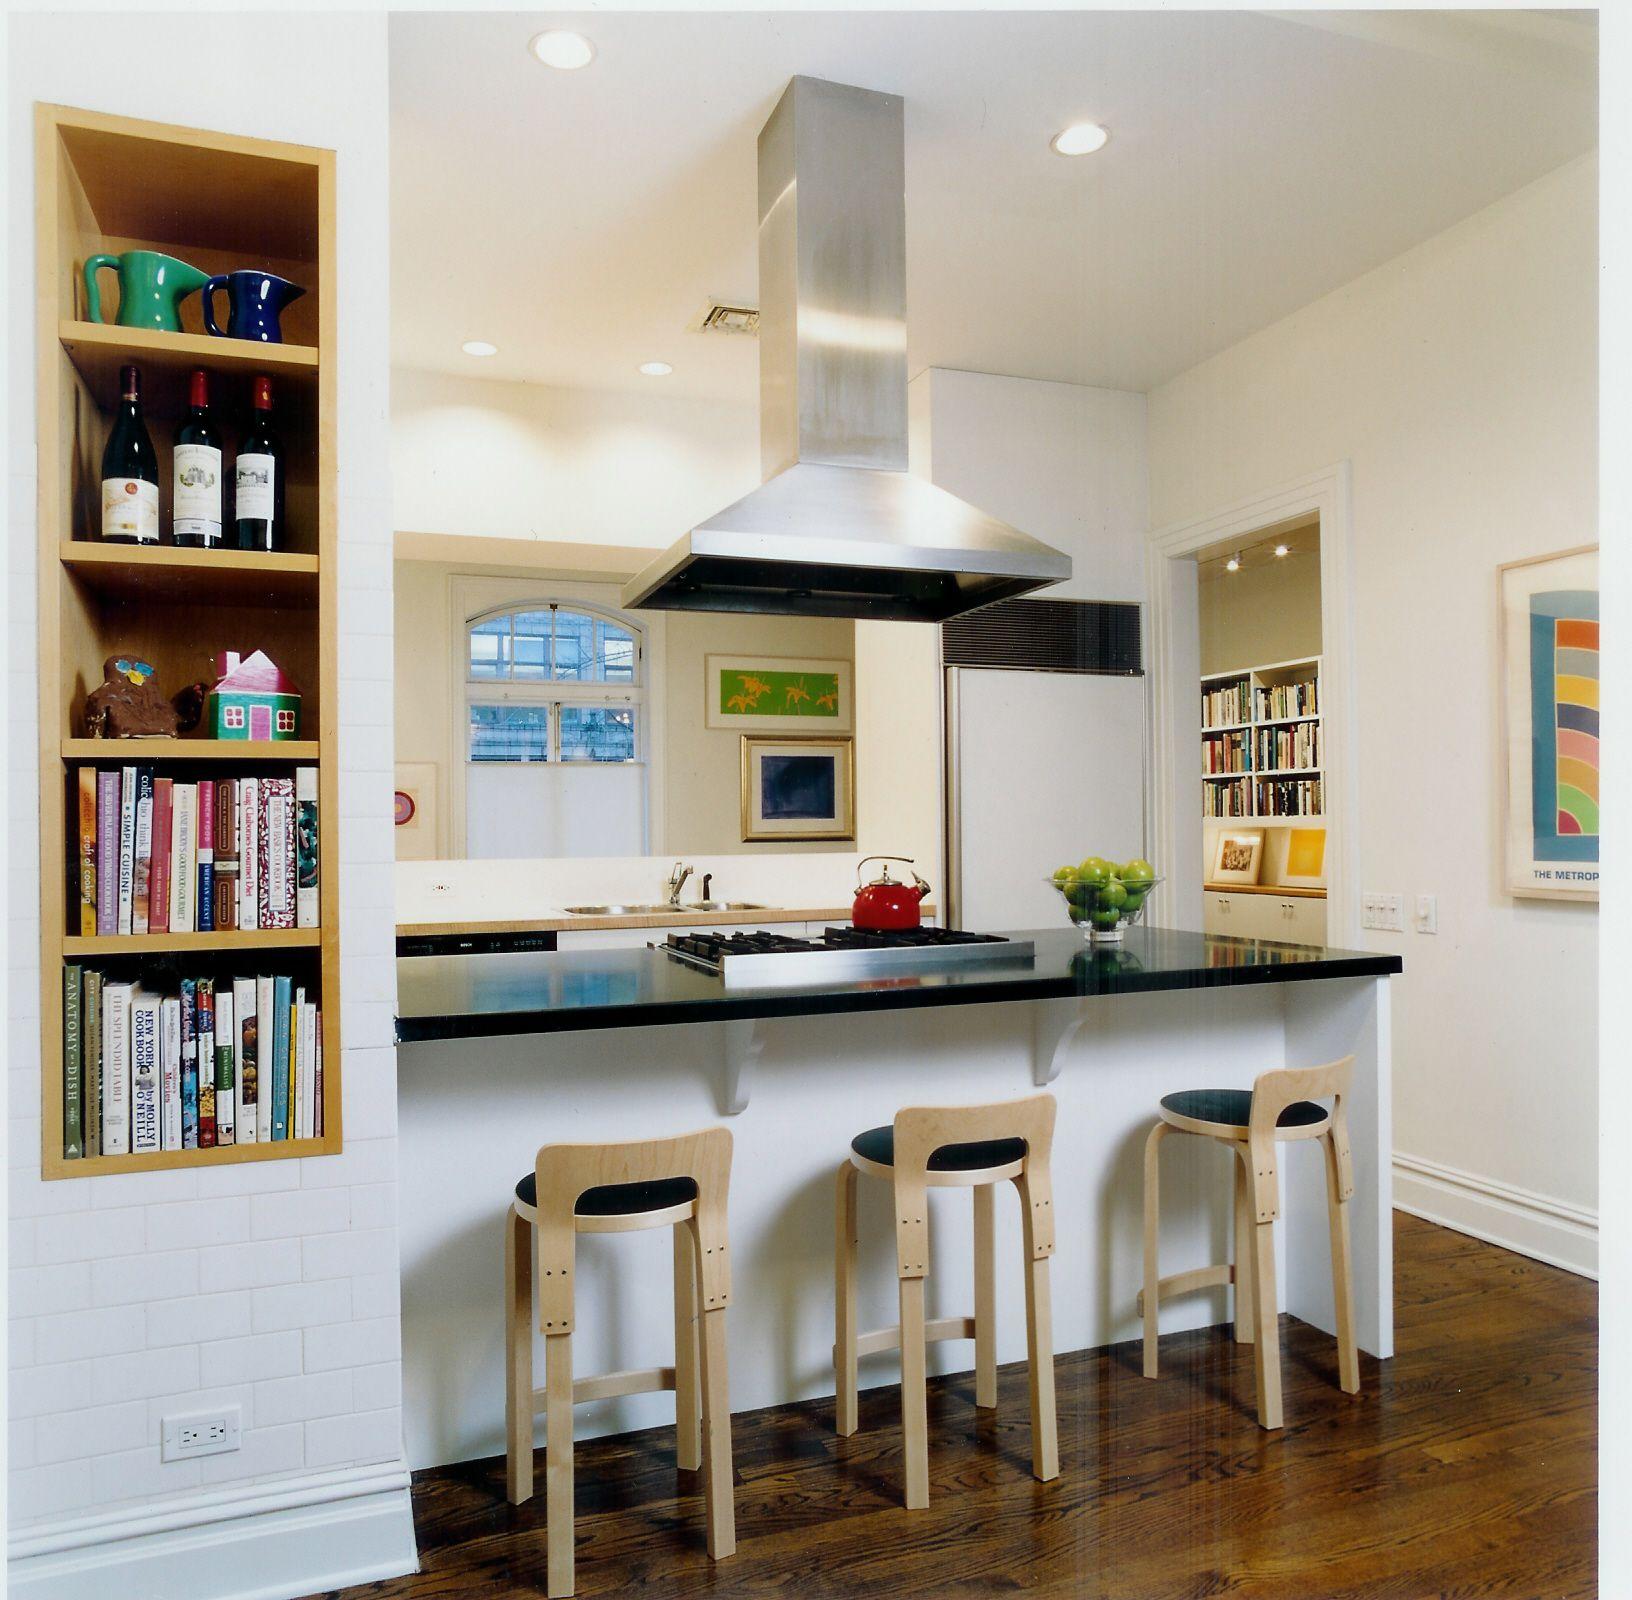 Kitchen Cabinets In Brooklyn Ny: Brooklyn Heights Kitchen Peninsula